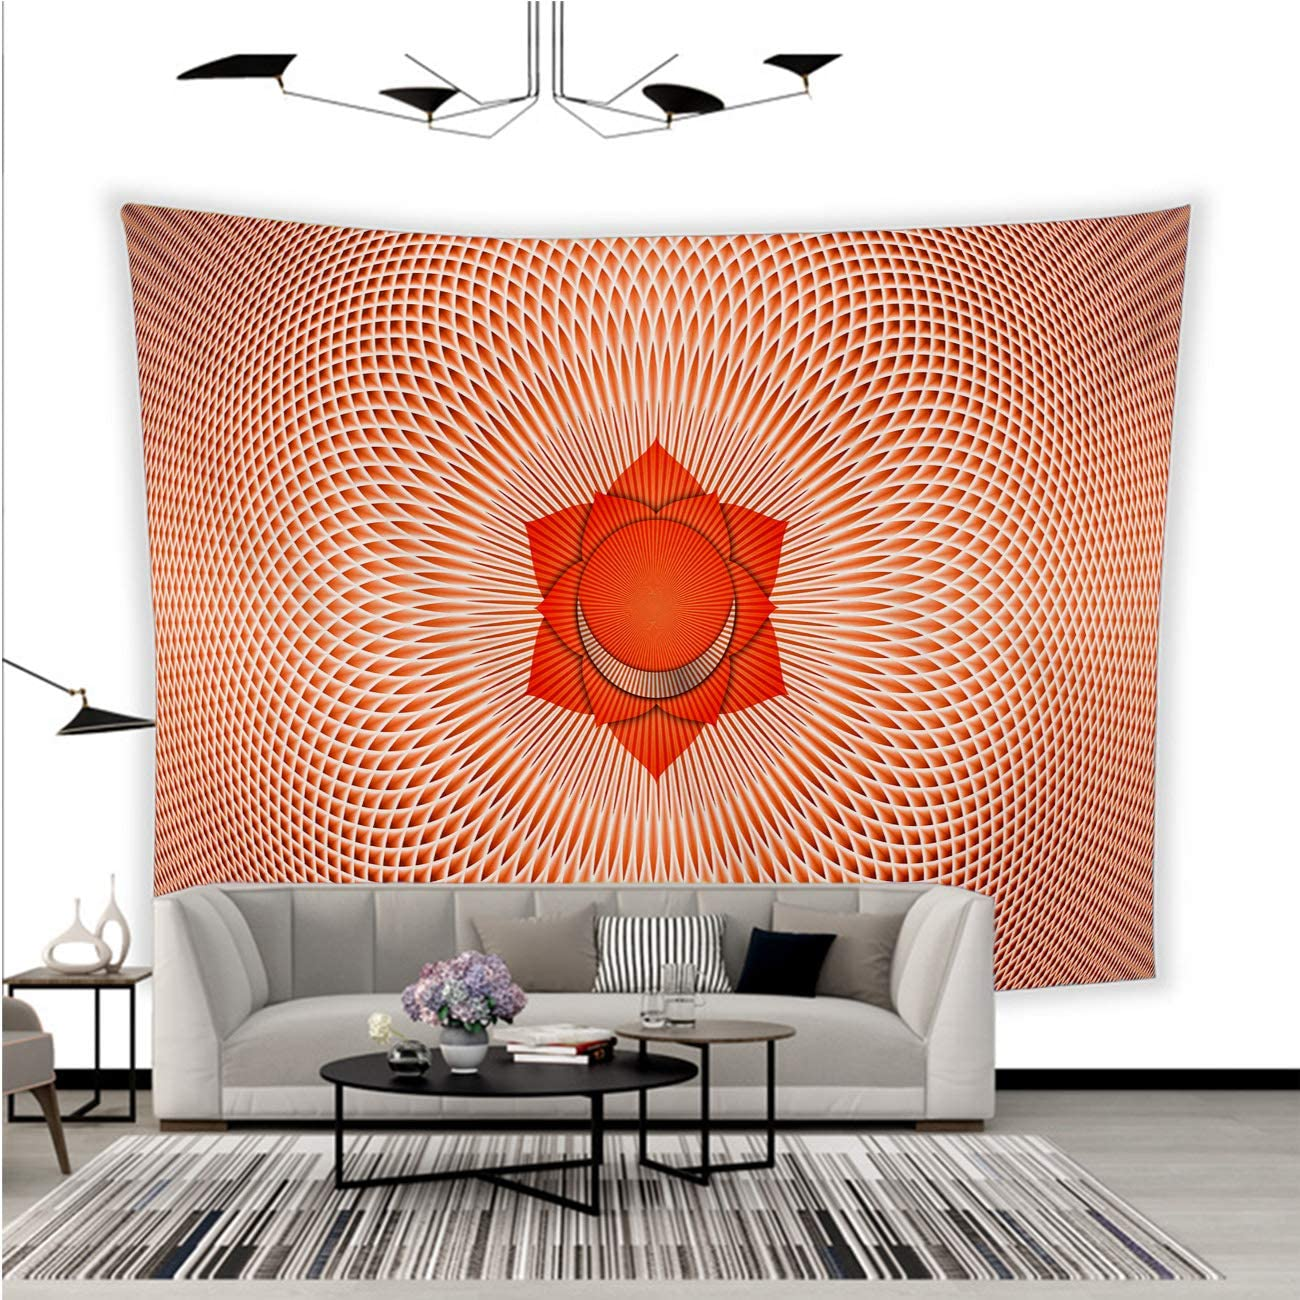 BEISISS Creative Tapestry Custom Wall Tapestry Orange Chakras Energy Center Yoga Chakra sacralchakra Solar Plexus Heart Chakra Throat Fabric Wall Hanging for Bedroom Living Room Dorm-80x70in